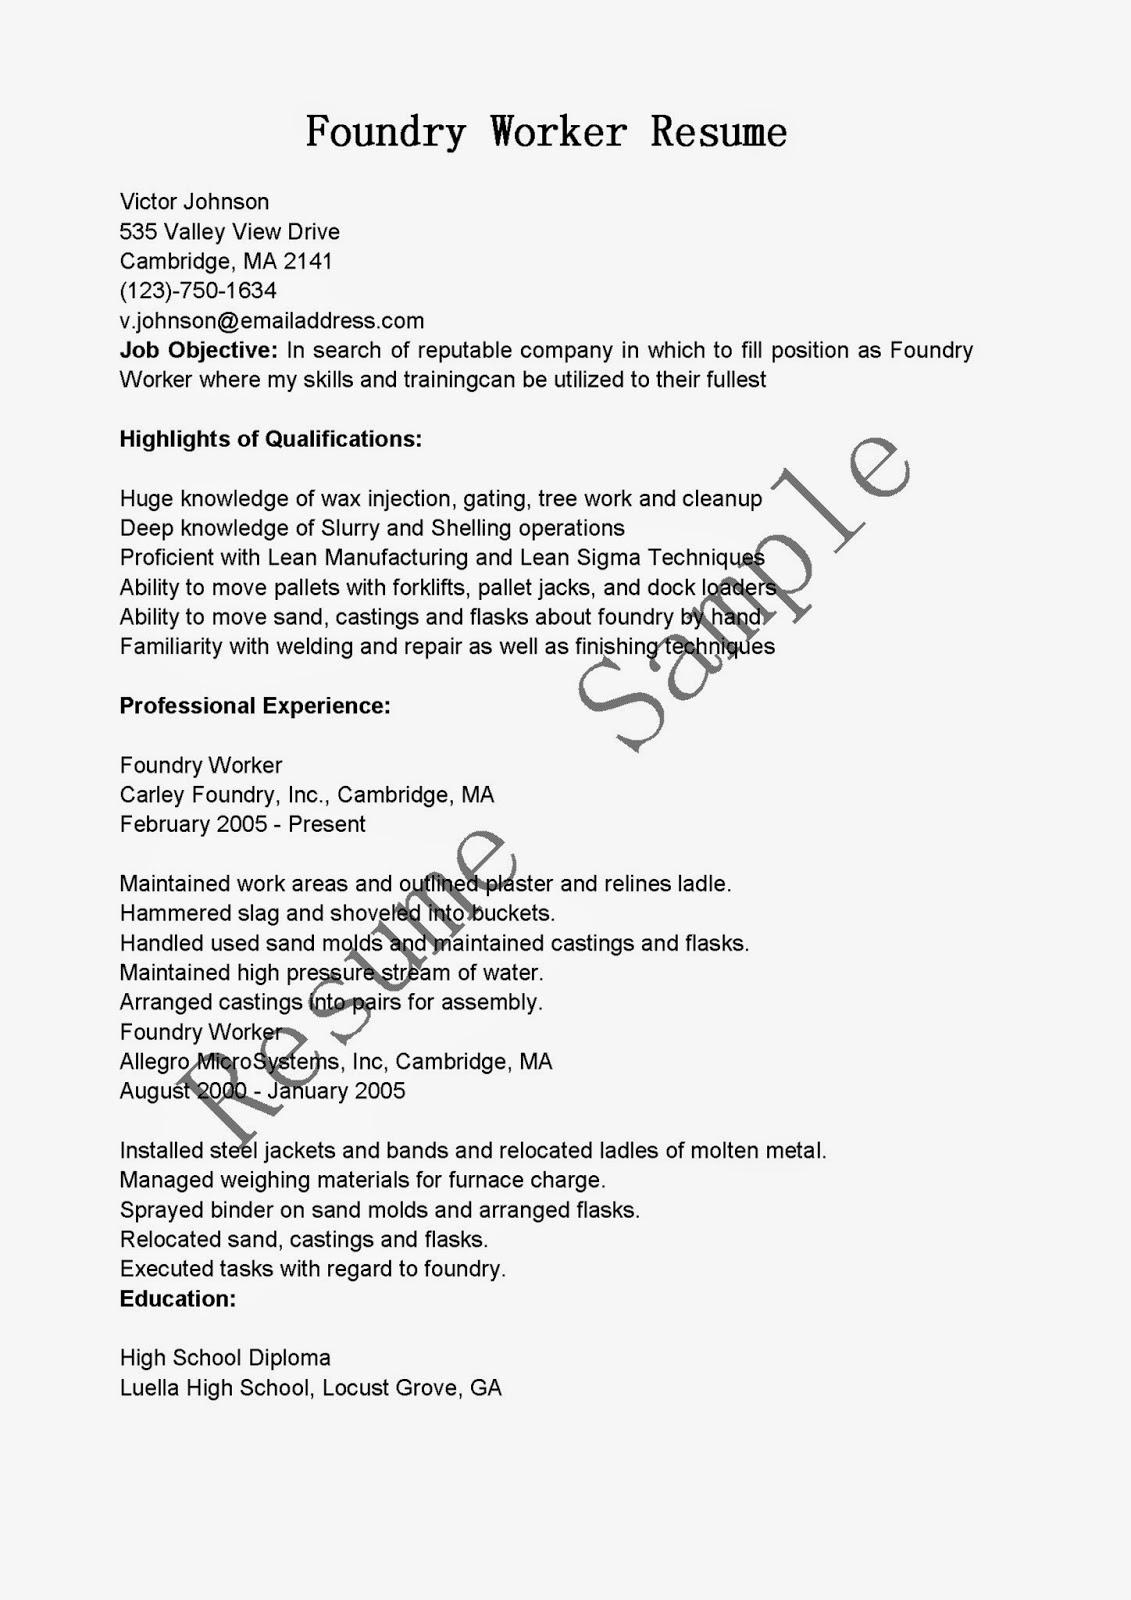 Journeyman Welder Resume Sample | Professional Essay Editing ...